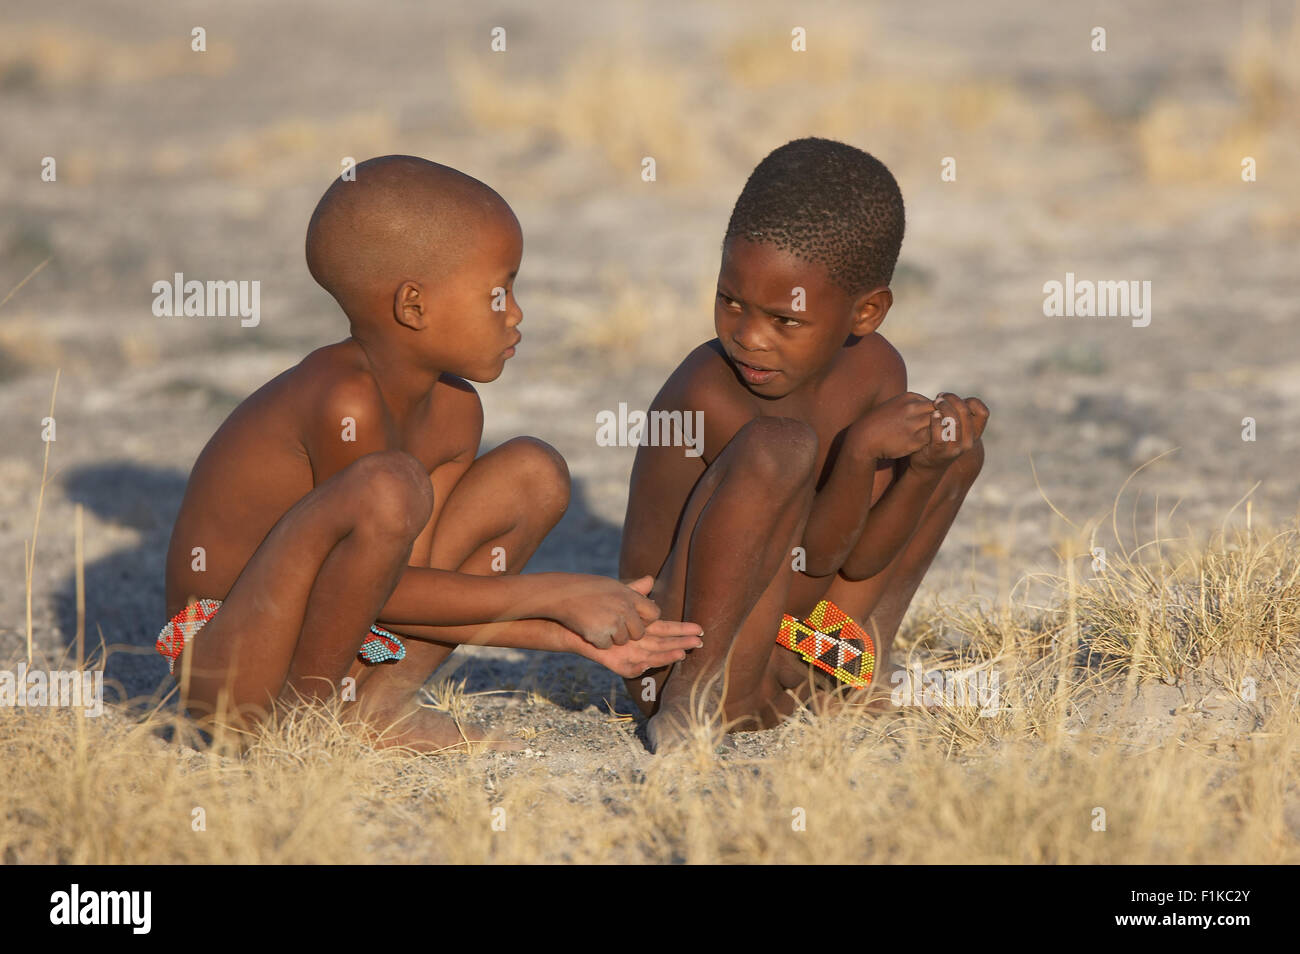 bushman-children-F1KC2Y.jpg